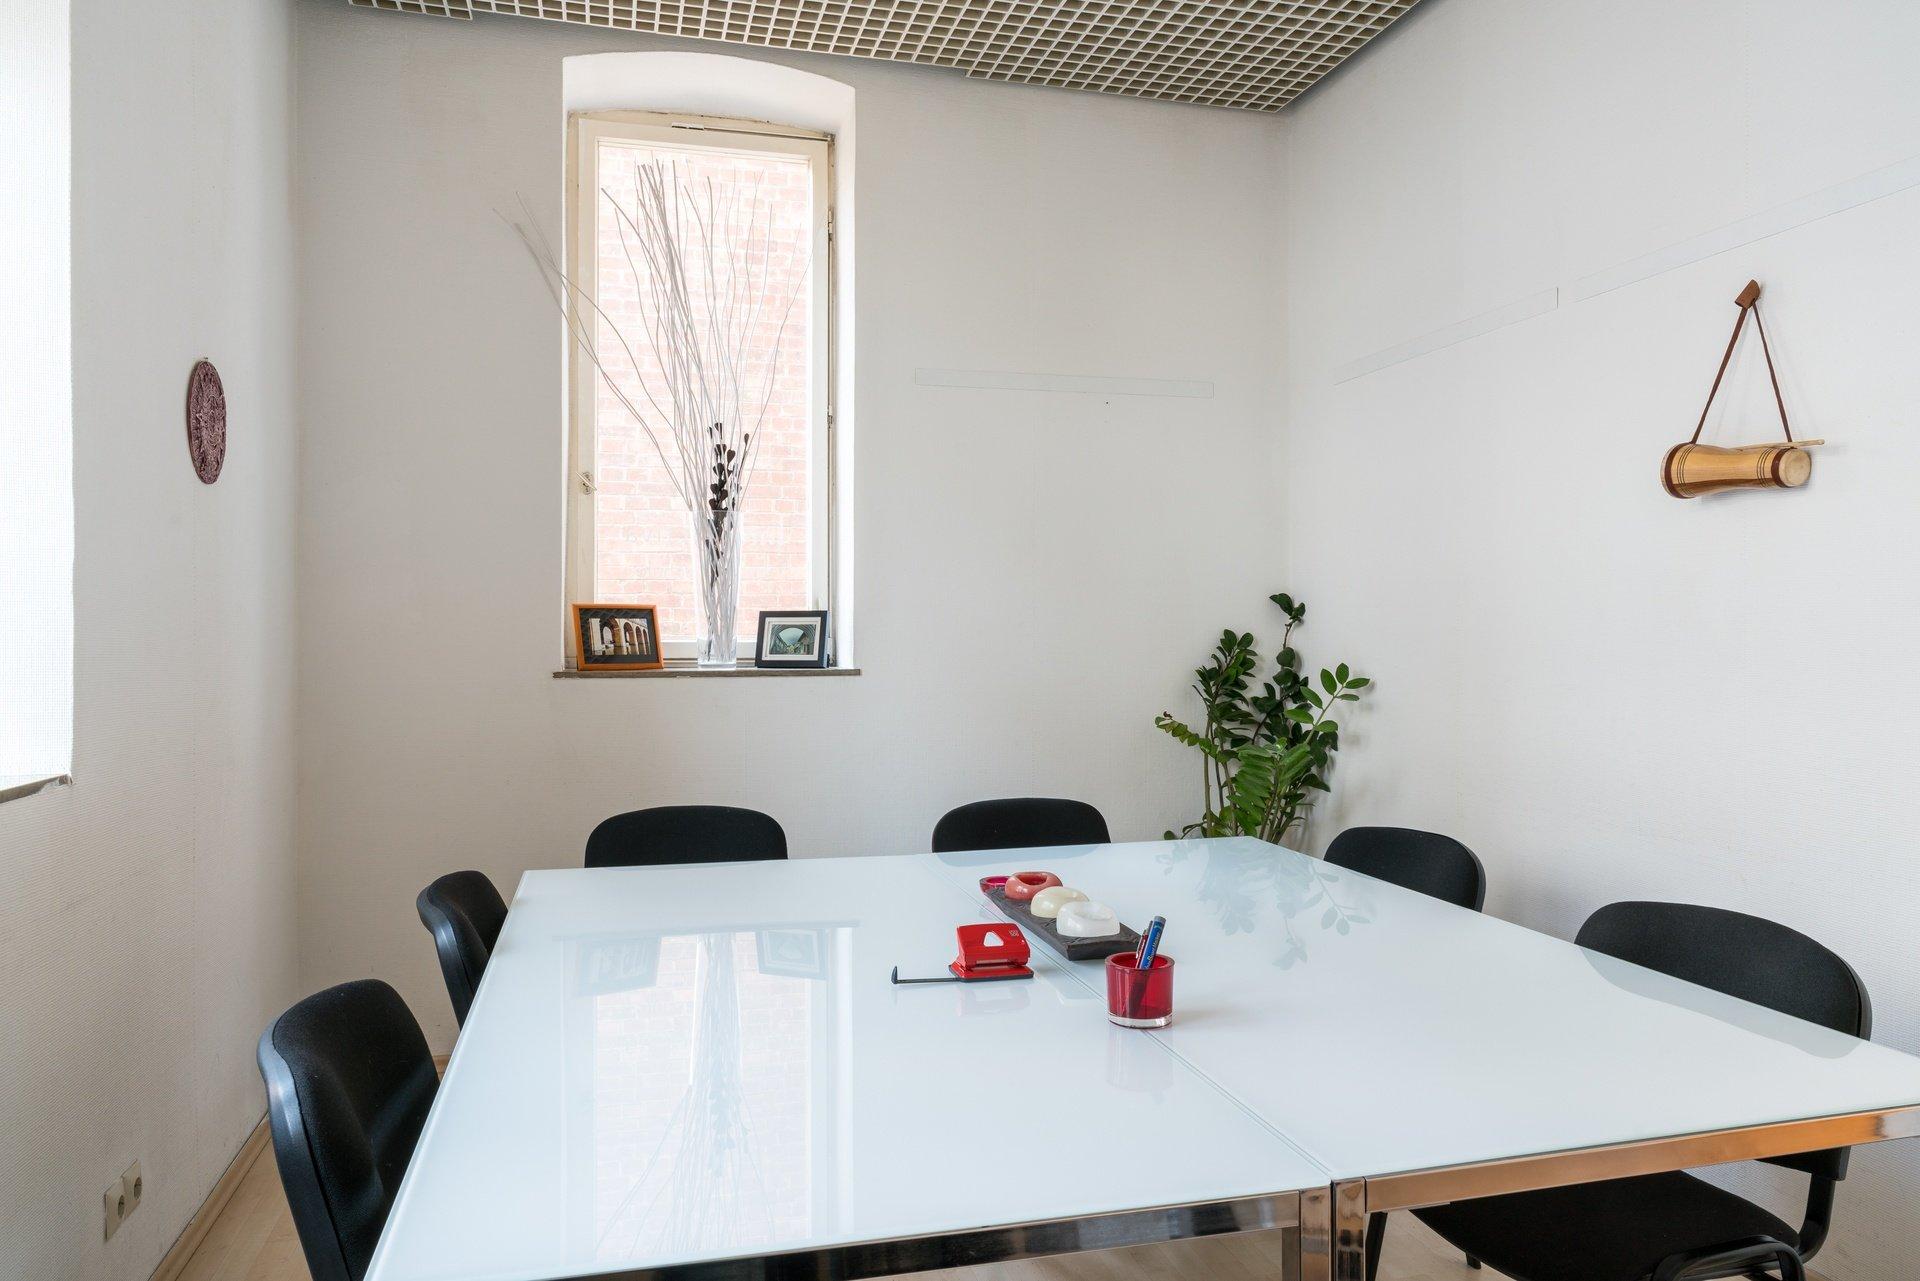 Stuttgart conference rooms Meeting room Interactiva - Room 2 image 0